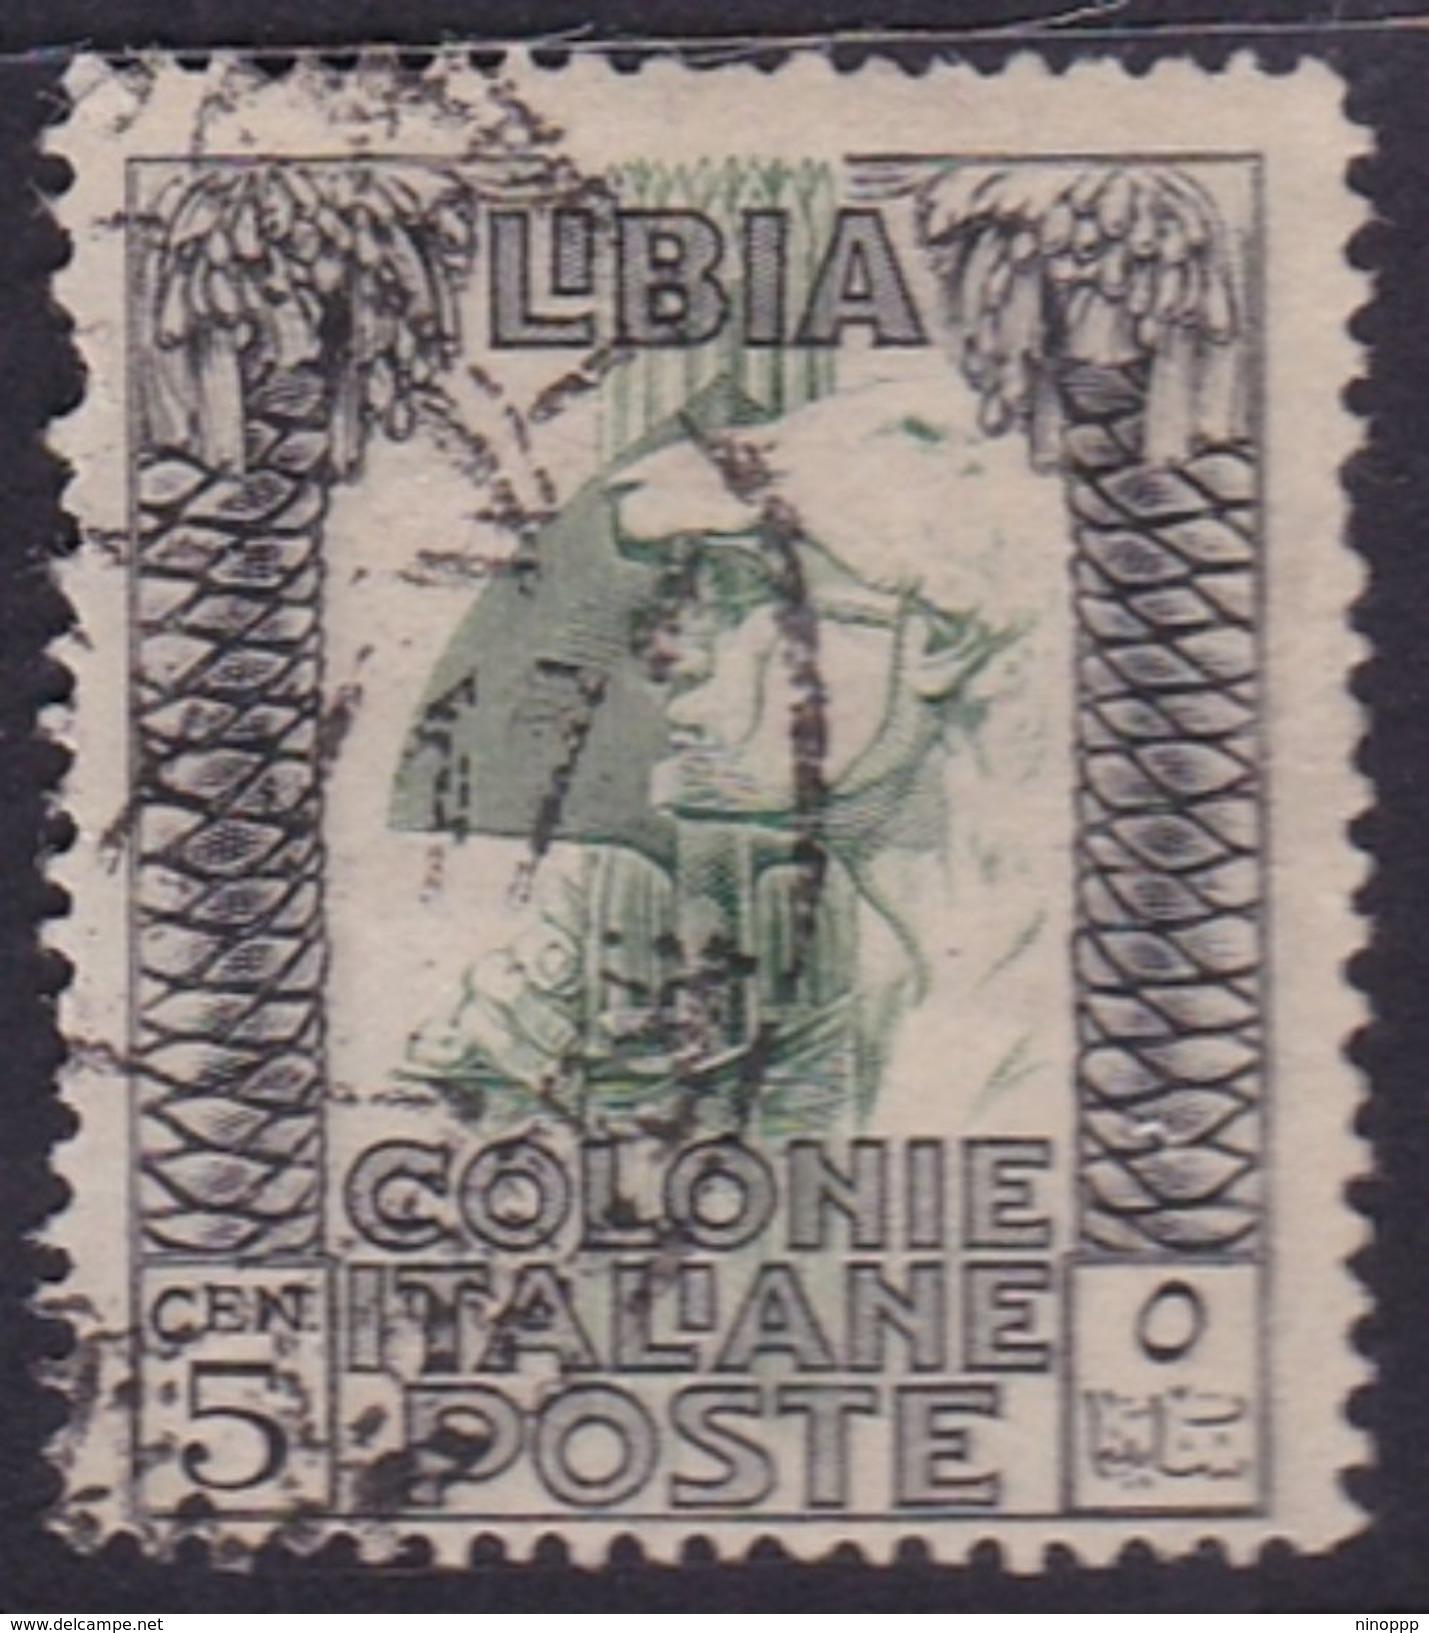 Italy-Colonies And Territories-Libya S 46 1924-29 ,Pictorials,5c Roman Legionary,used - Libya